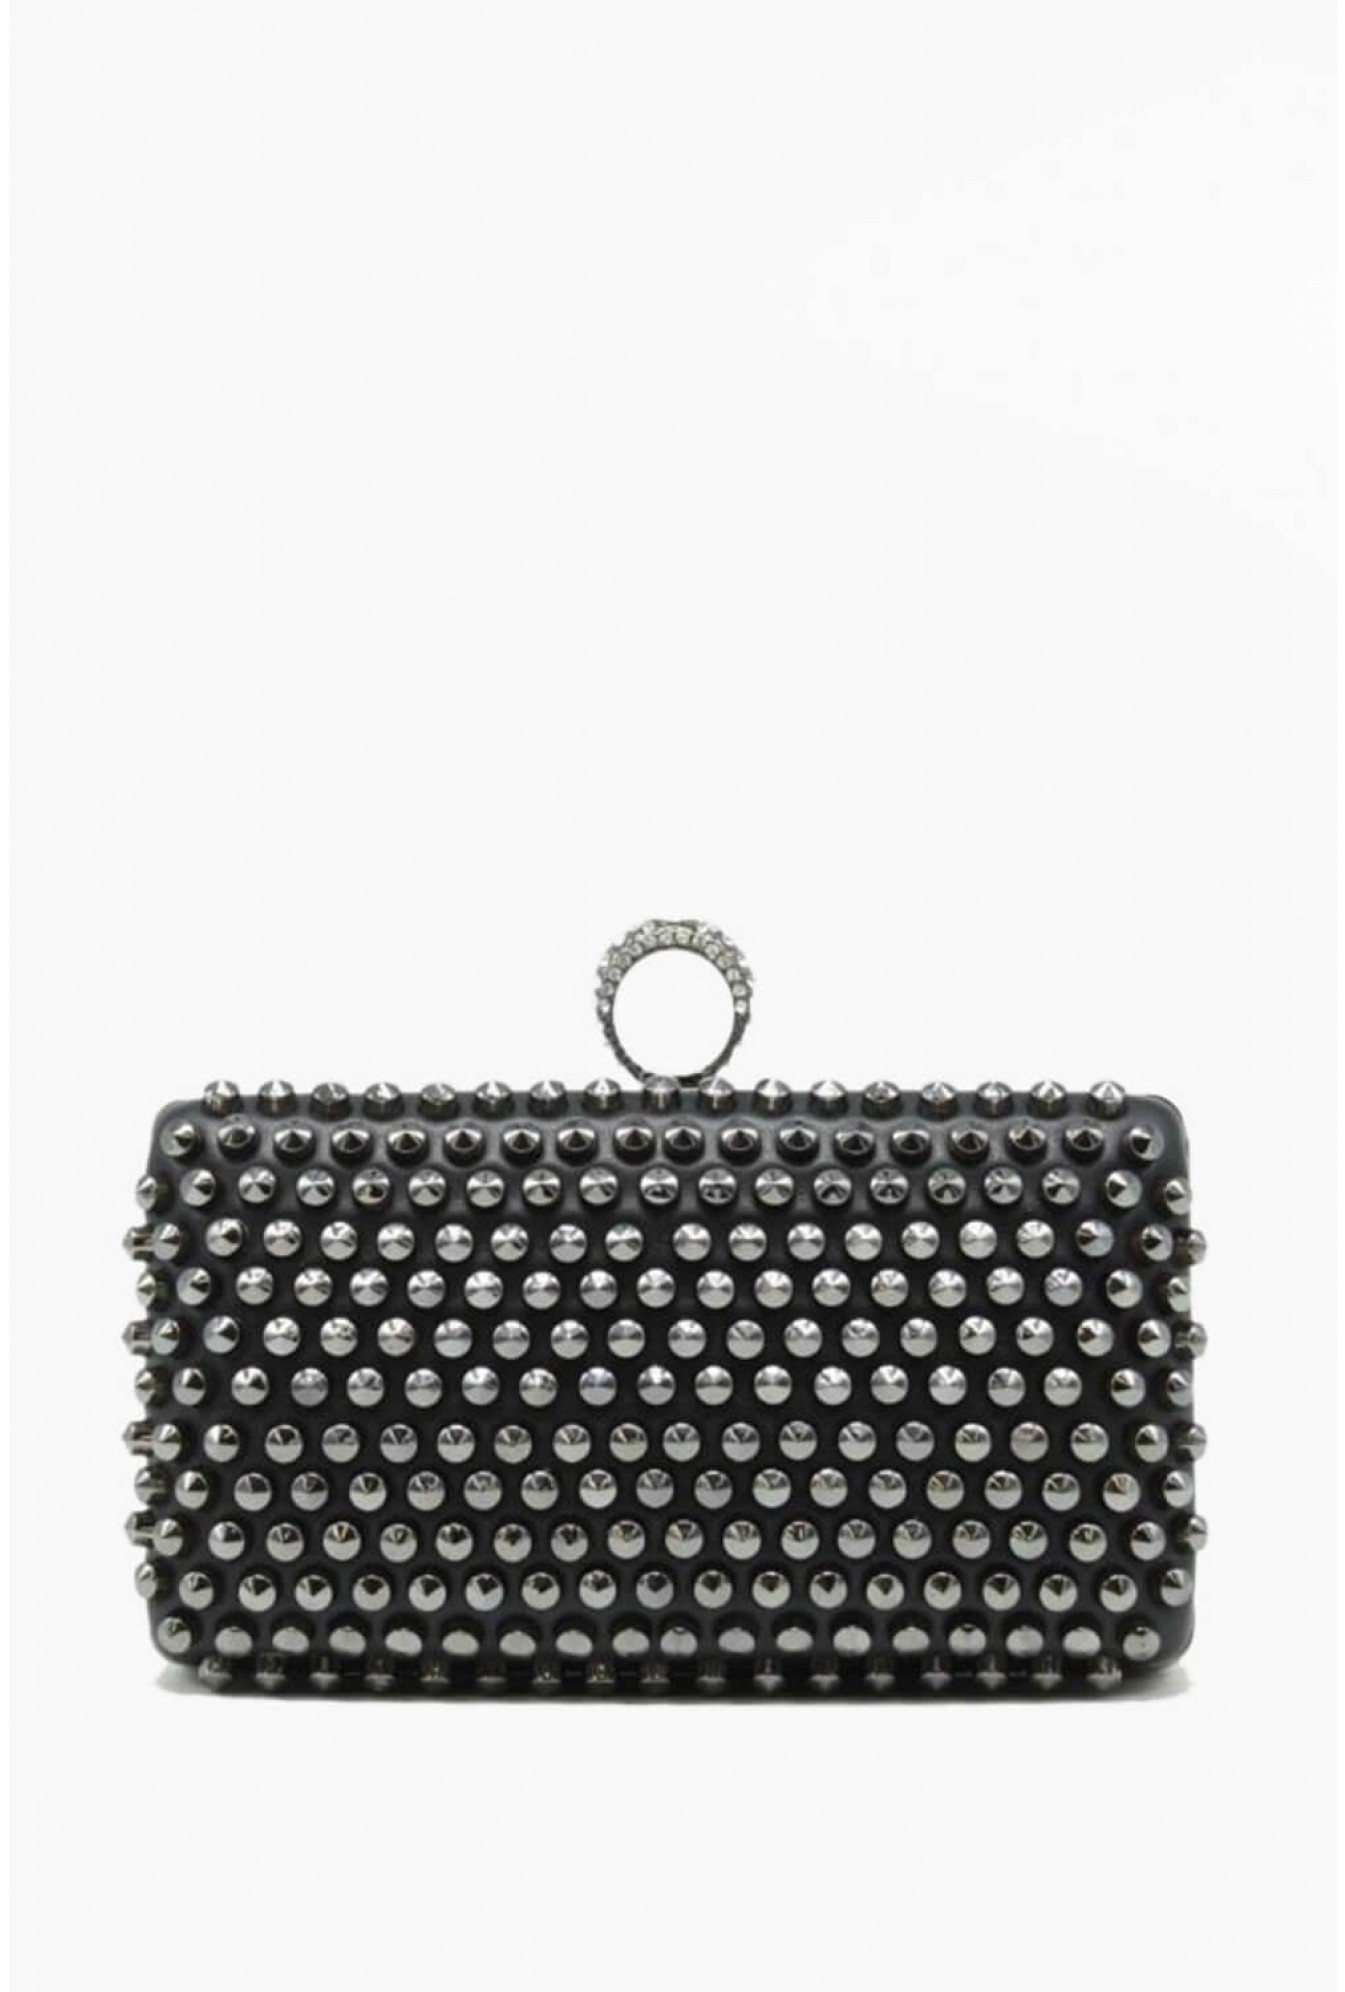 9f4f0bc80ec Tom & Eva Jayne Studded Clutch Bag in Black   iCLOTHING